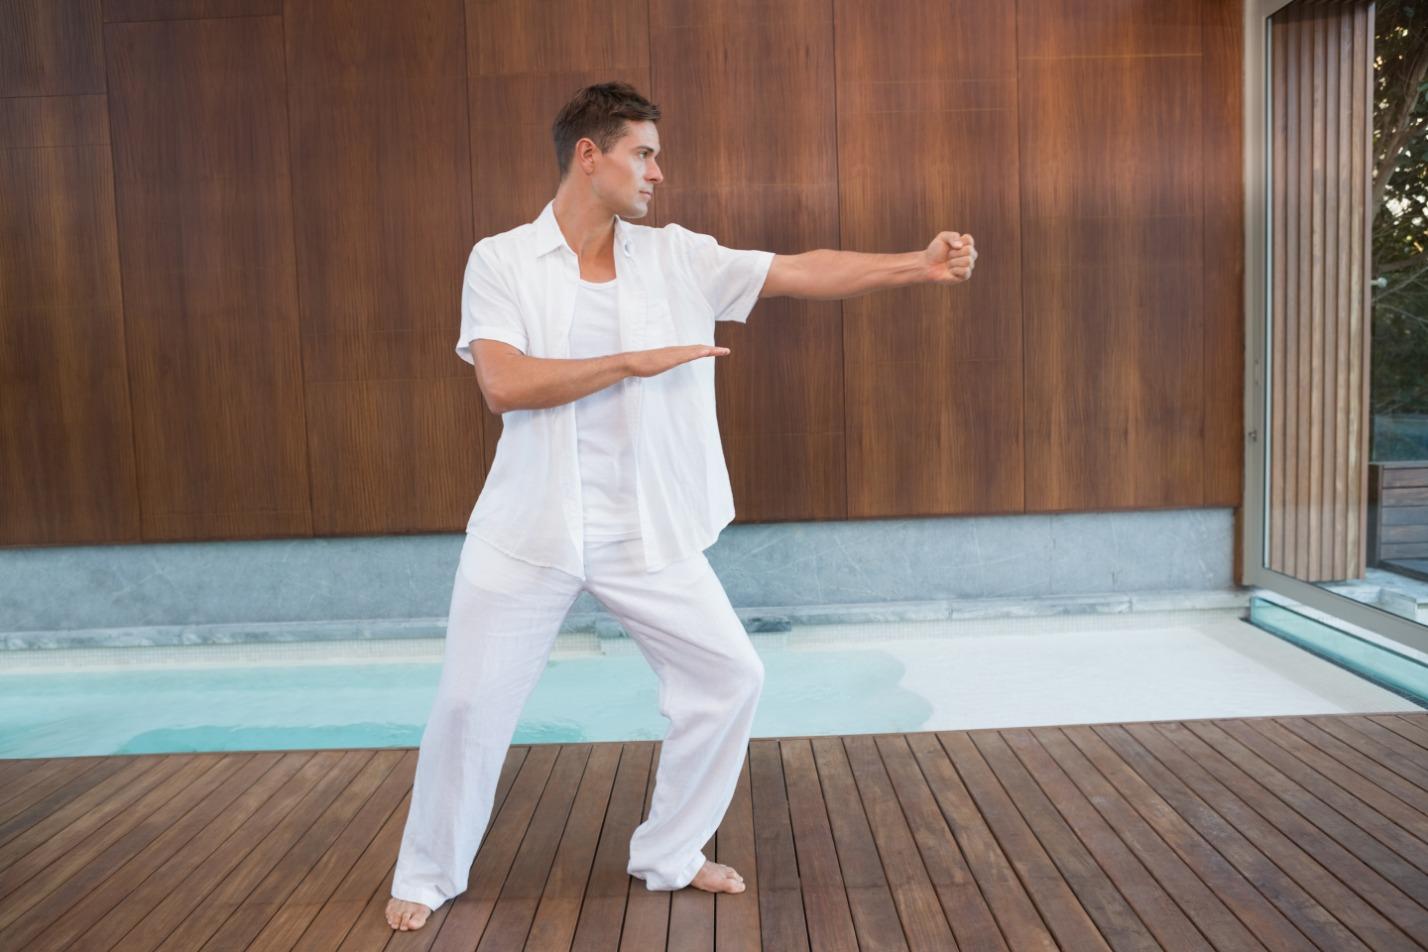 Pre karate